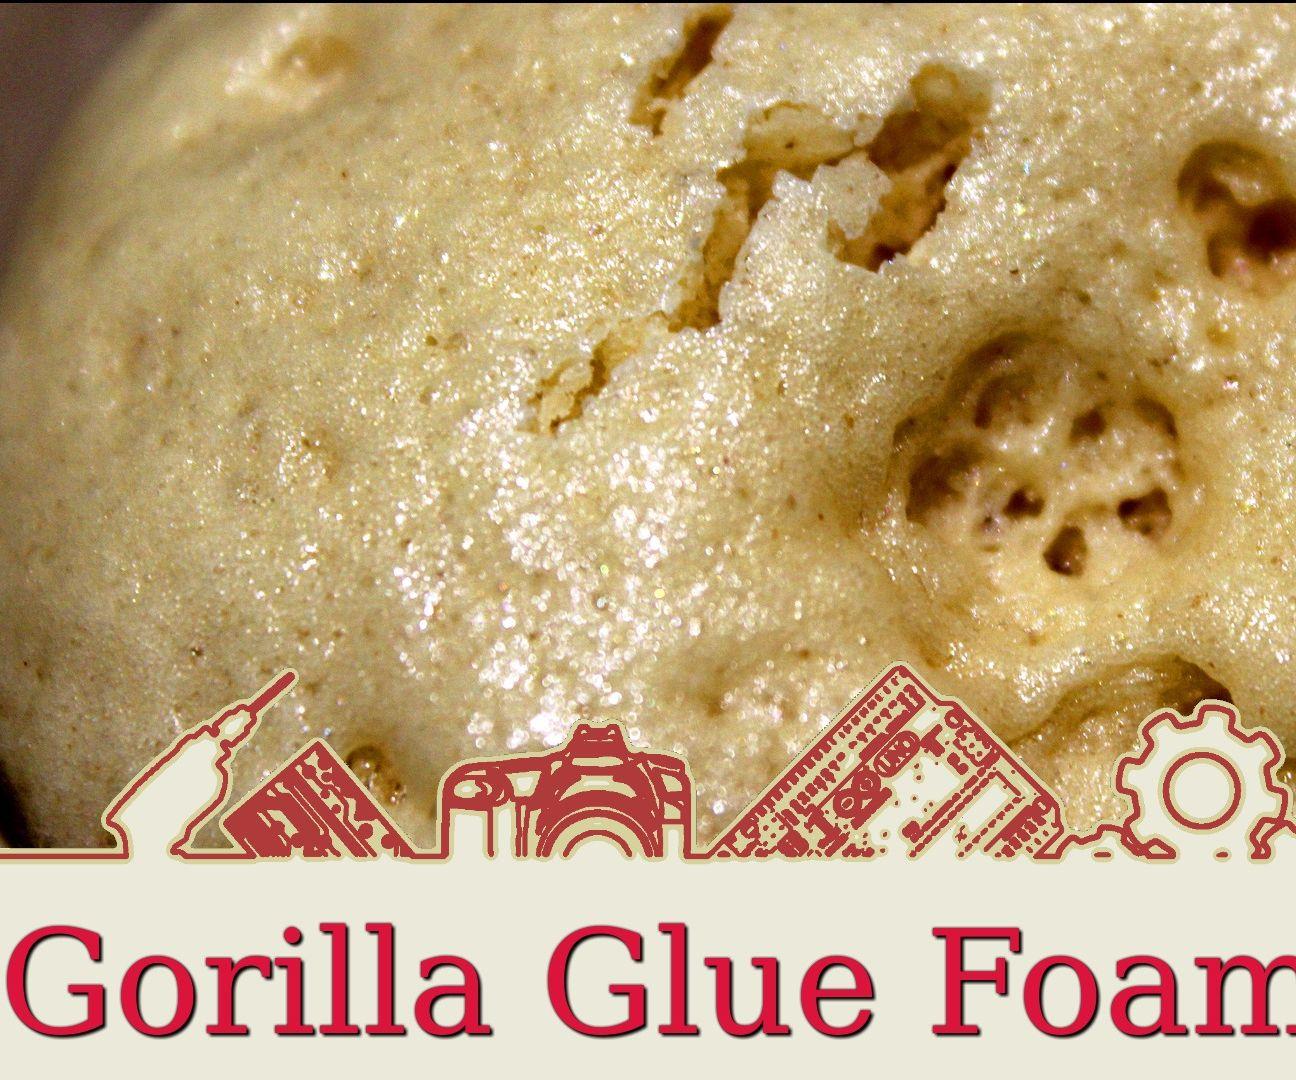 Gorilla Glue Foam